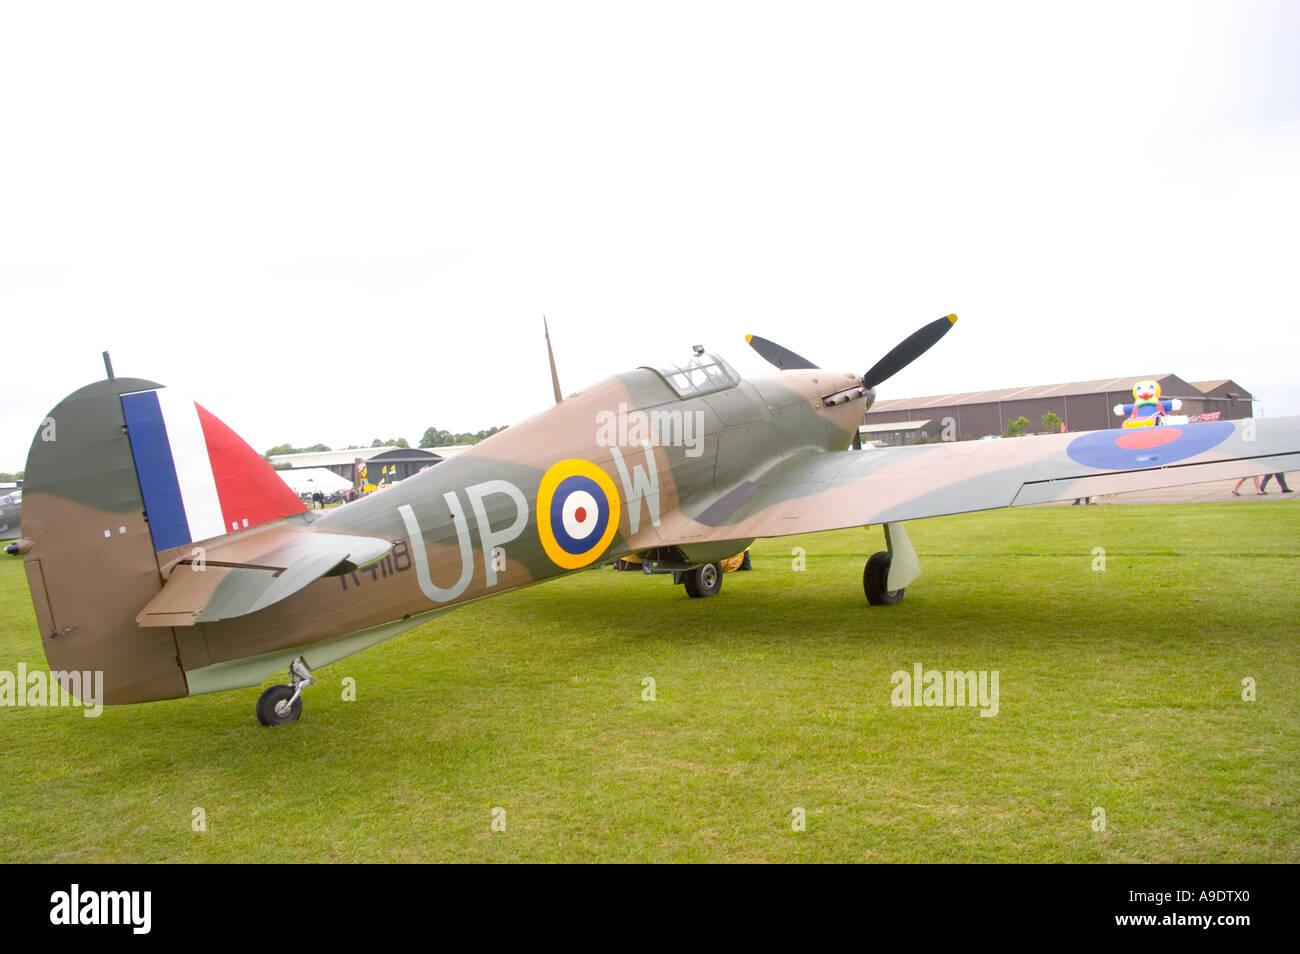 Hurricane RAF Aircraft - Stock Image